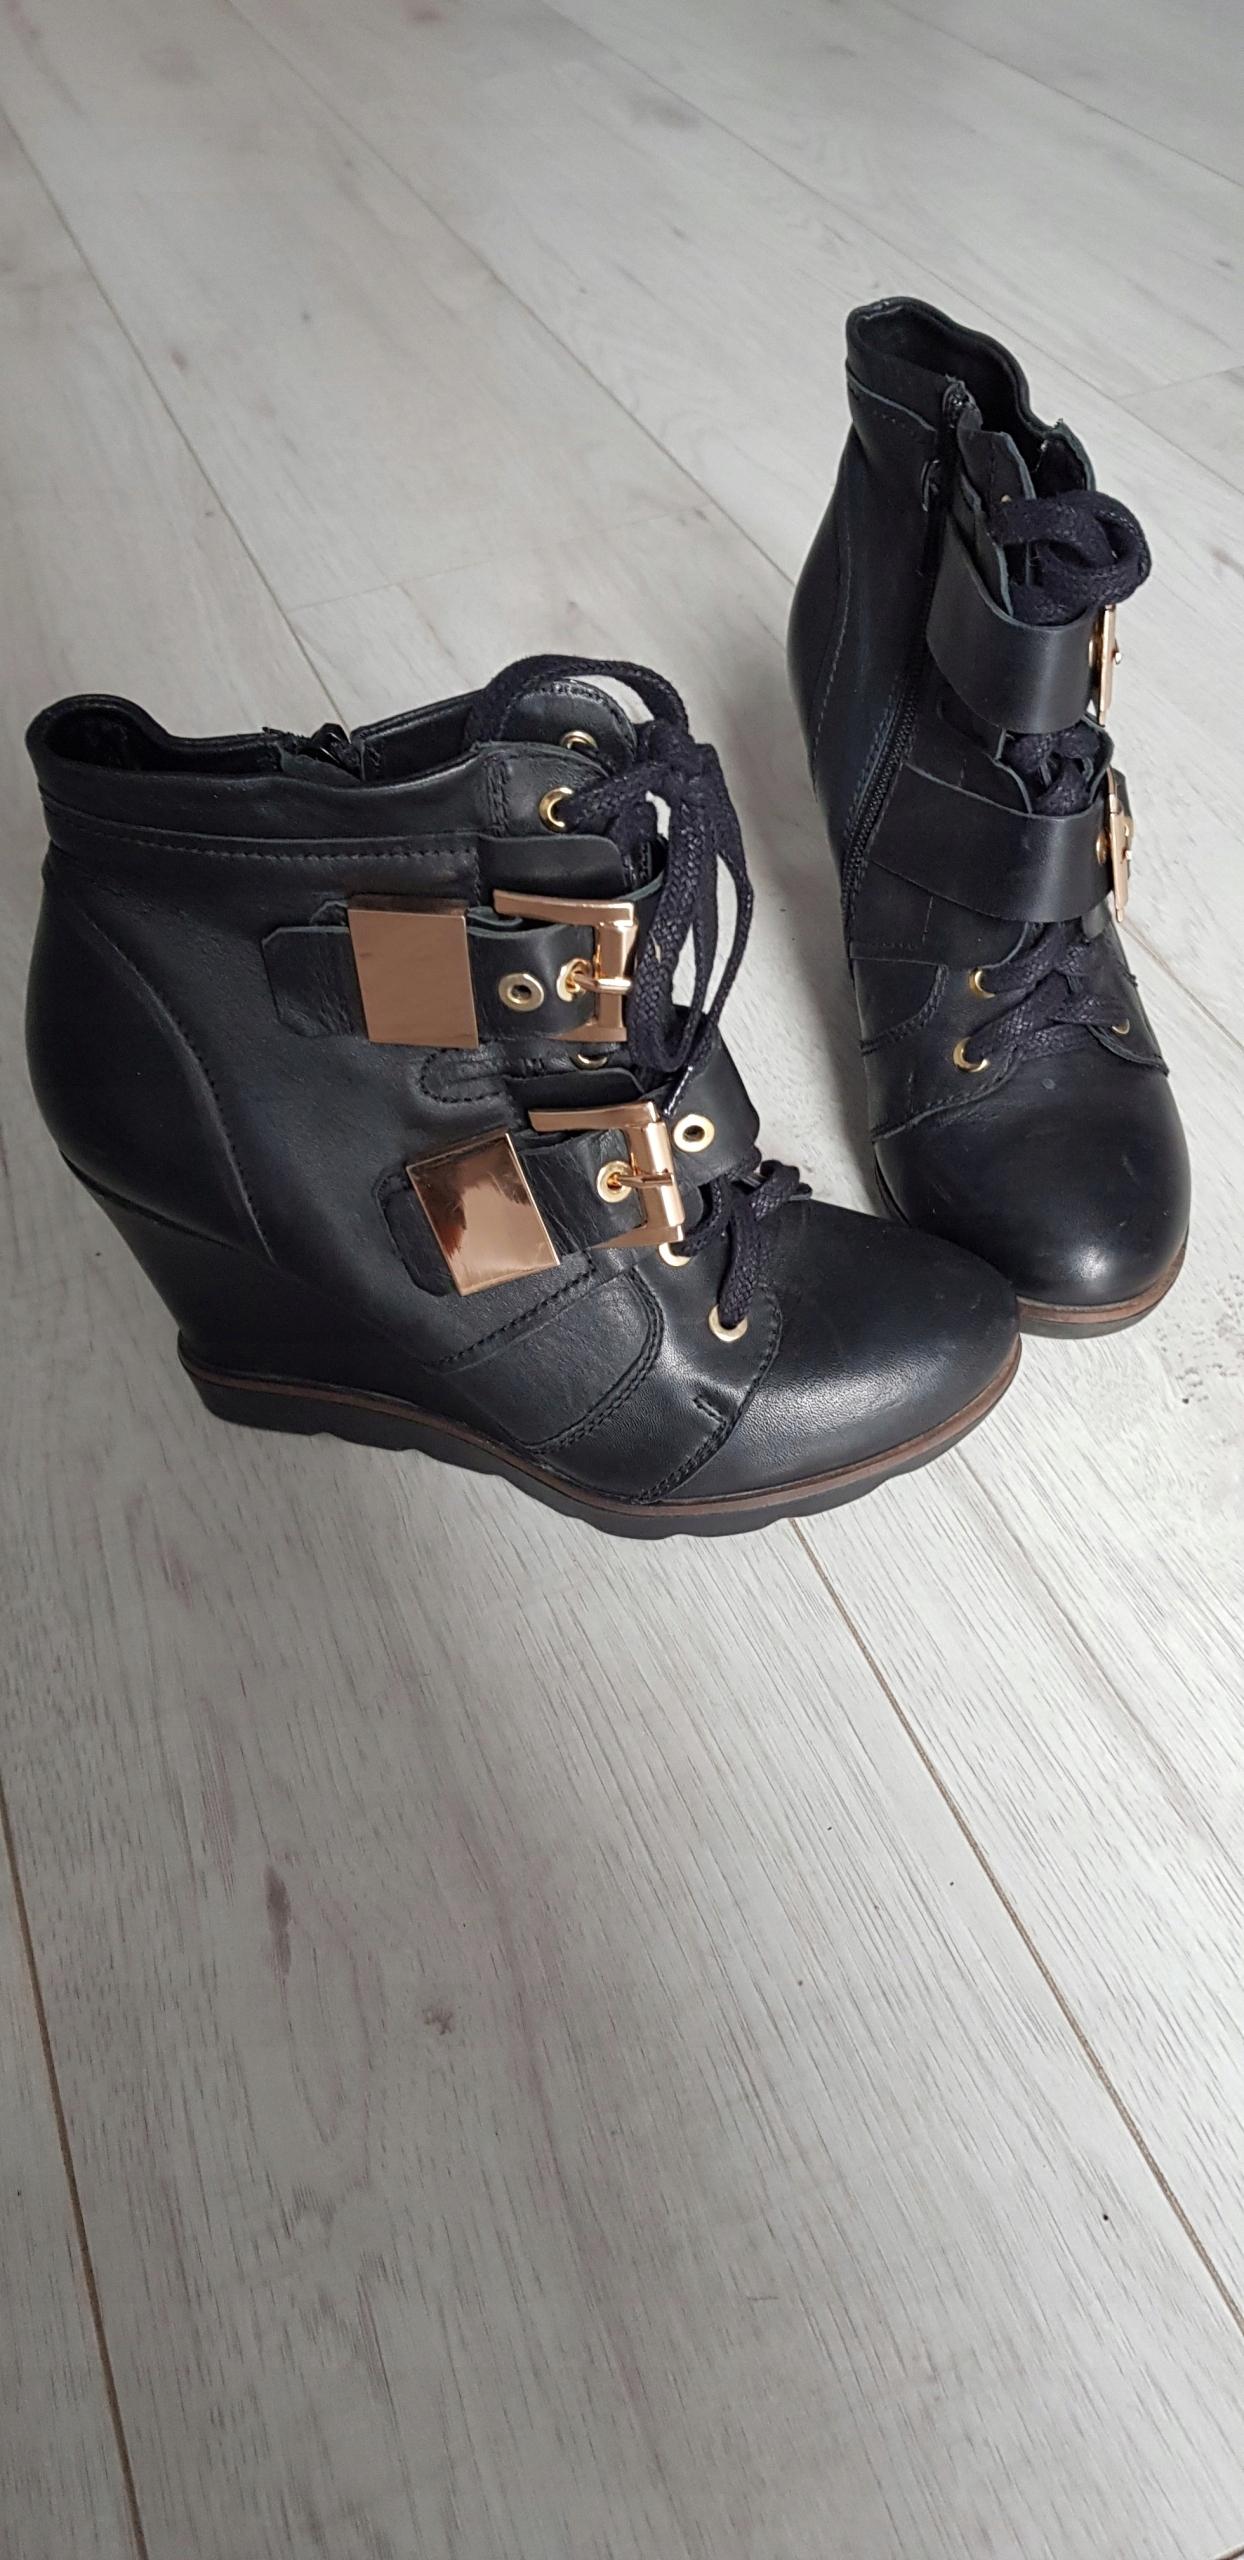 cc752b11 Kazar buty róż.38 skóra - 7532428272 - oficjalne archiwum allegro